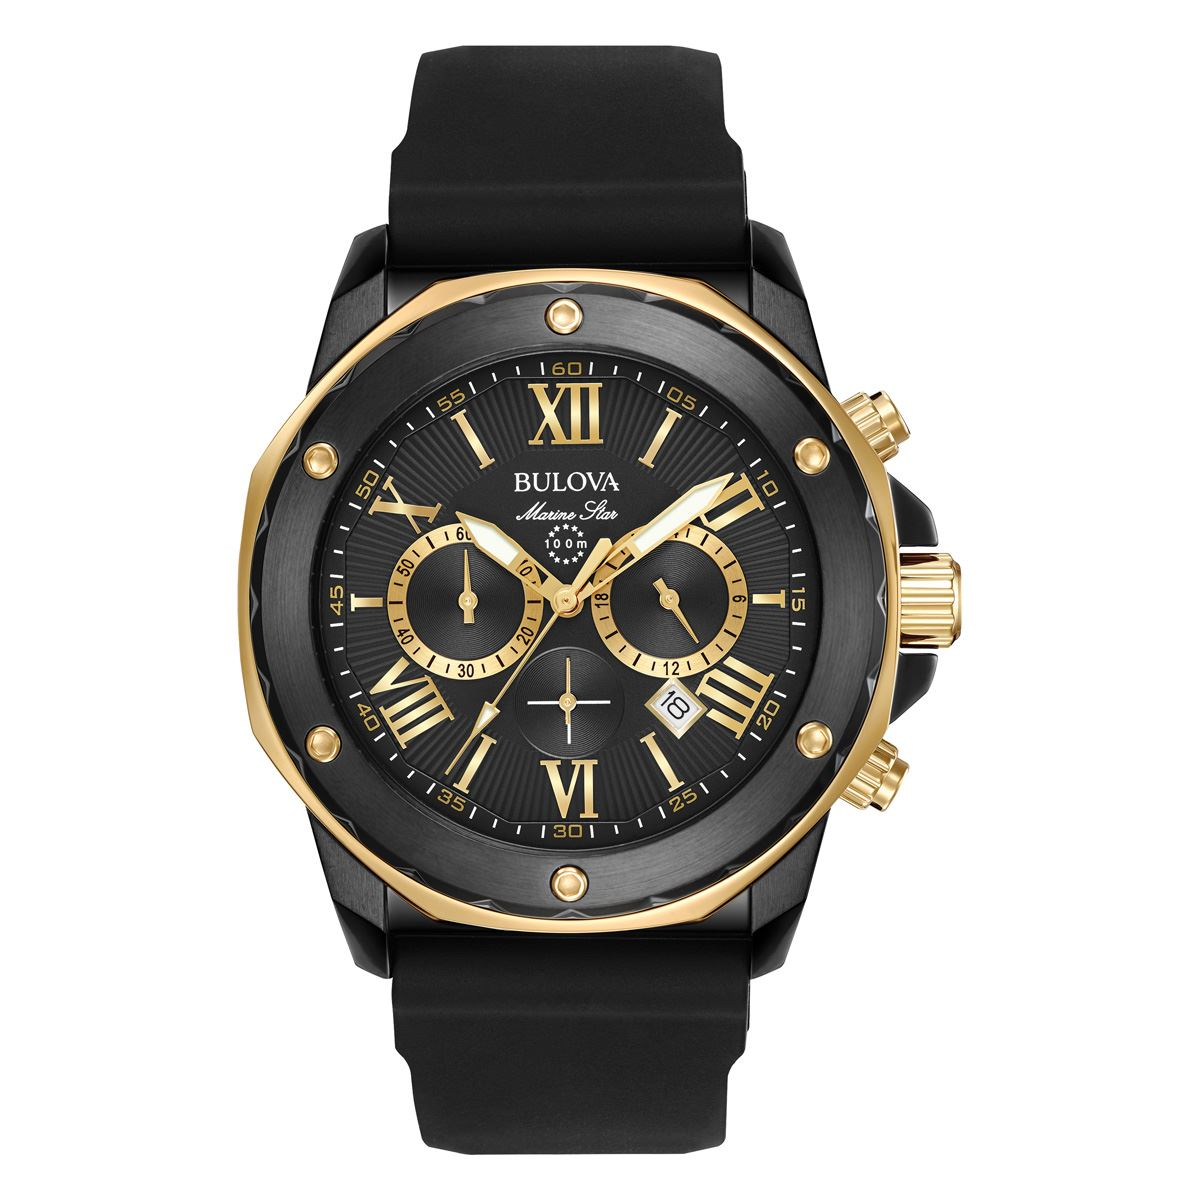 Reloj Bulova 96b138 Stainless Steel Cronografo Cnuevo S 6cc361605b7e